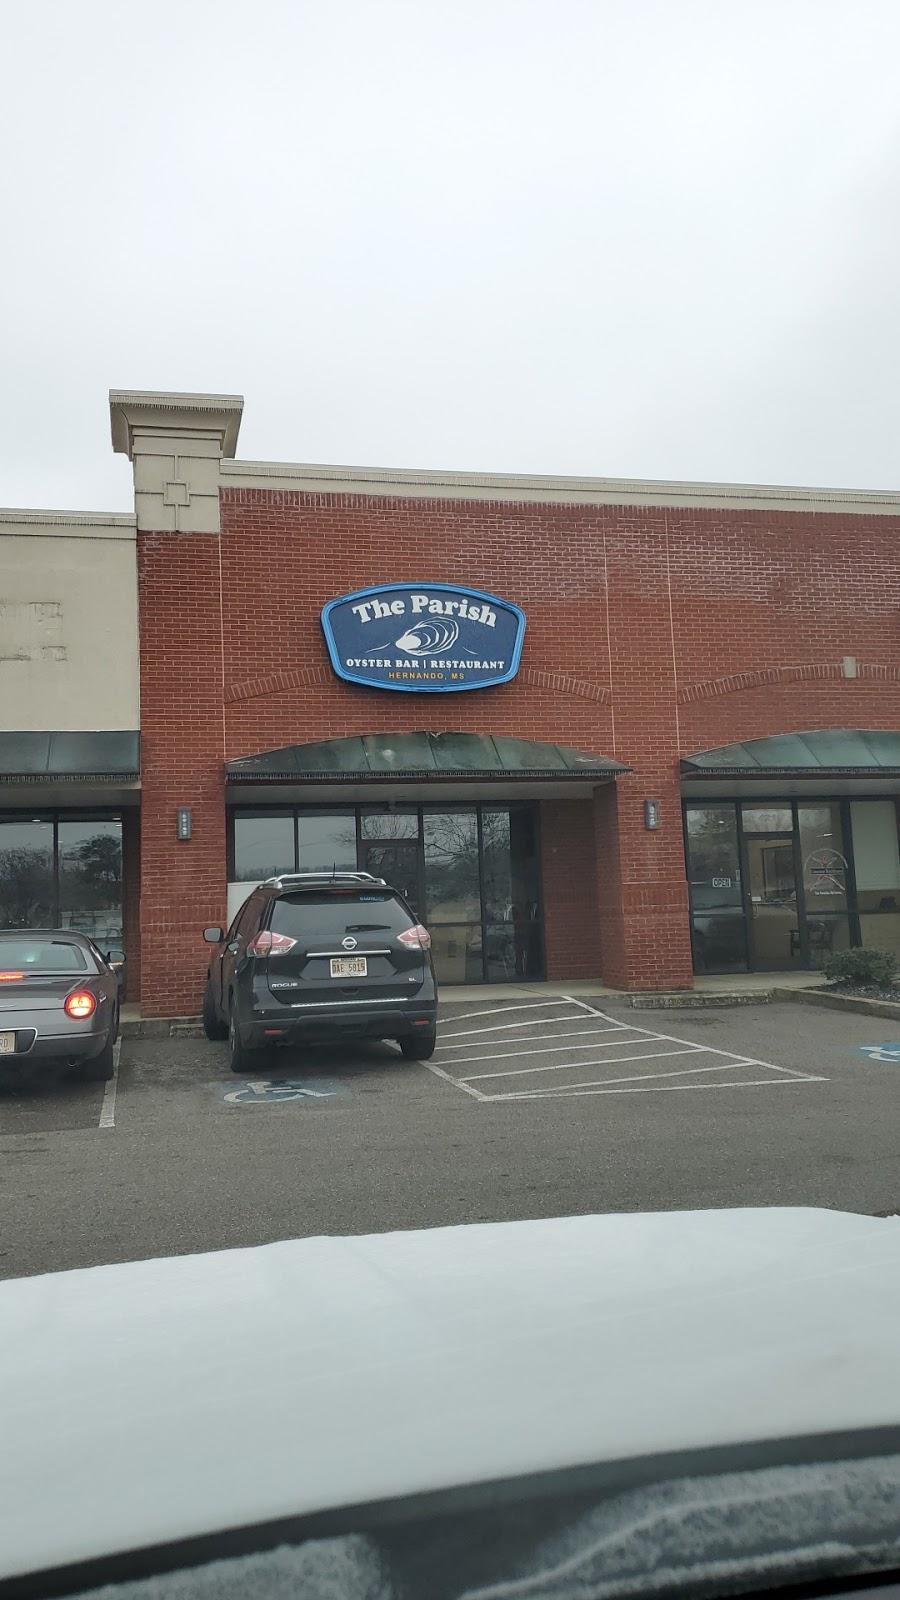 The Parish Oyster Bar & Restaurant   restaurant   427 E Commerce St, Hernando, MS 38632, USA